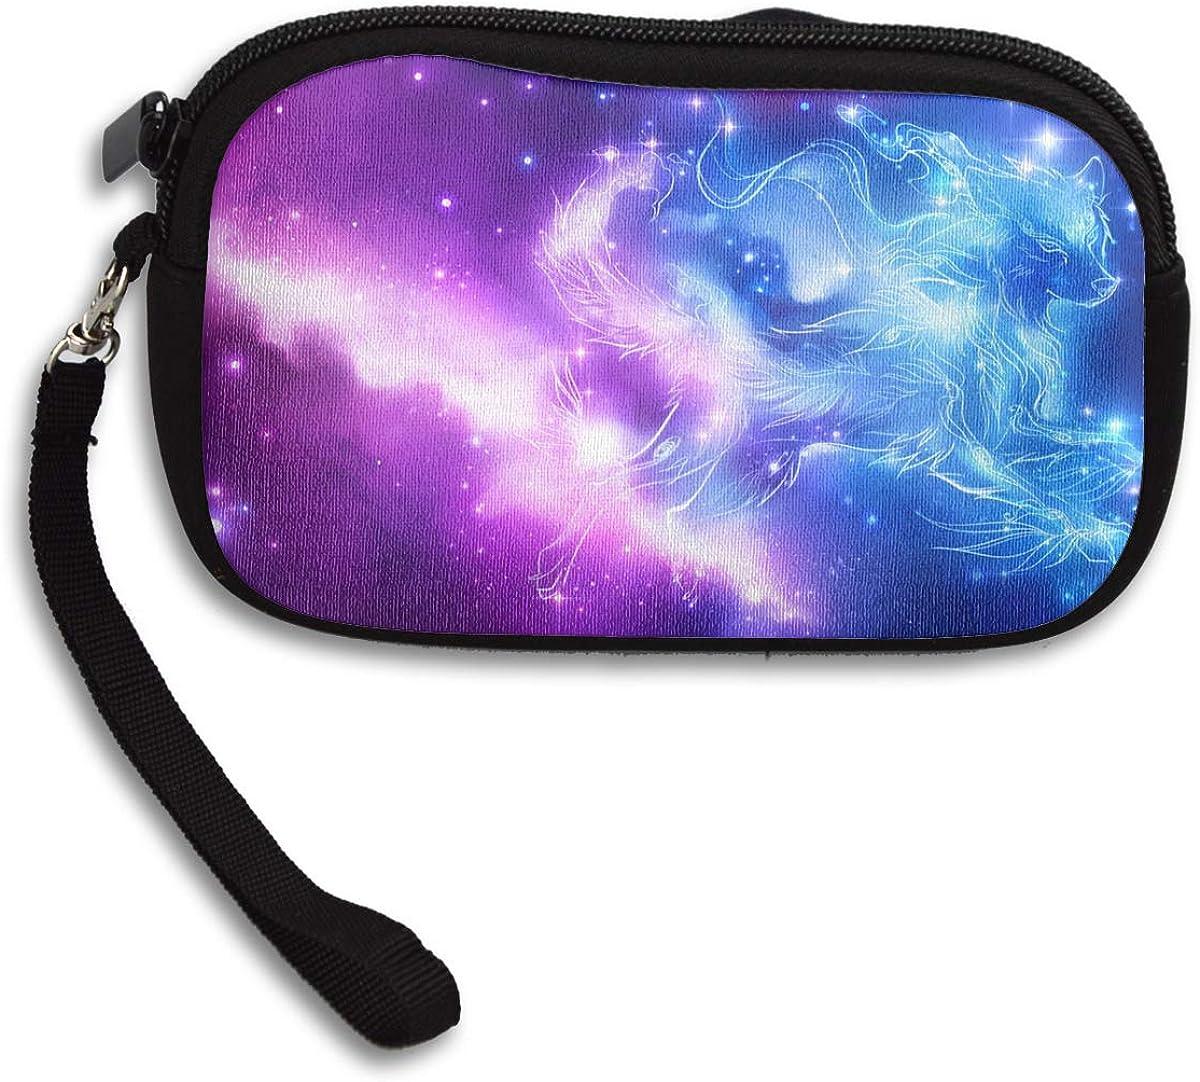 Galaxy Wolf Phone Purse Handbag Tote Purse//Compact Clutch Bag Purses Ladies Clutch Long Purse Large Capacity Evening Purse Womens Clutches Purse